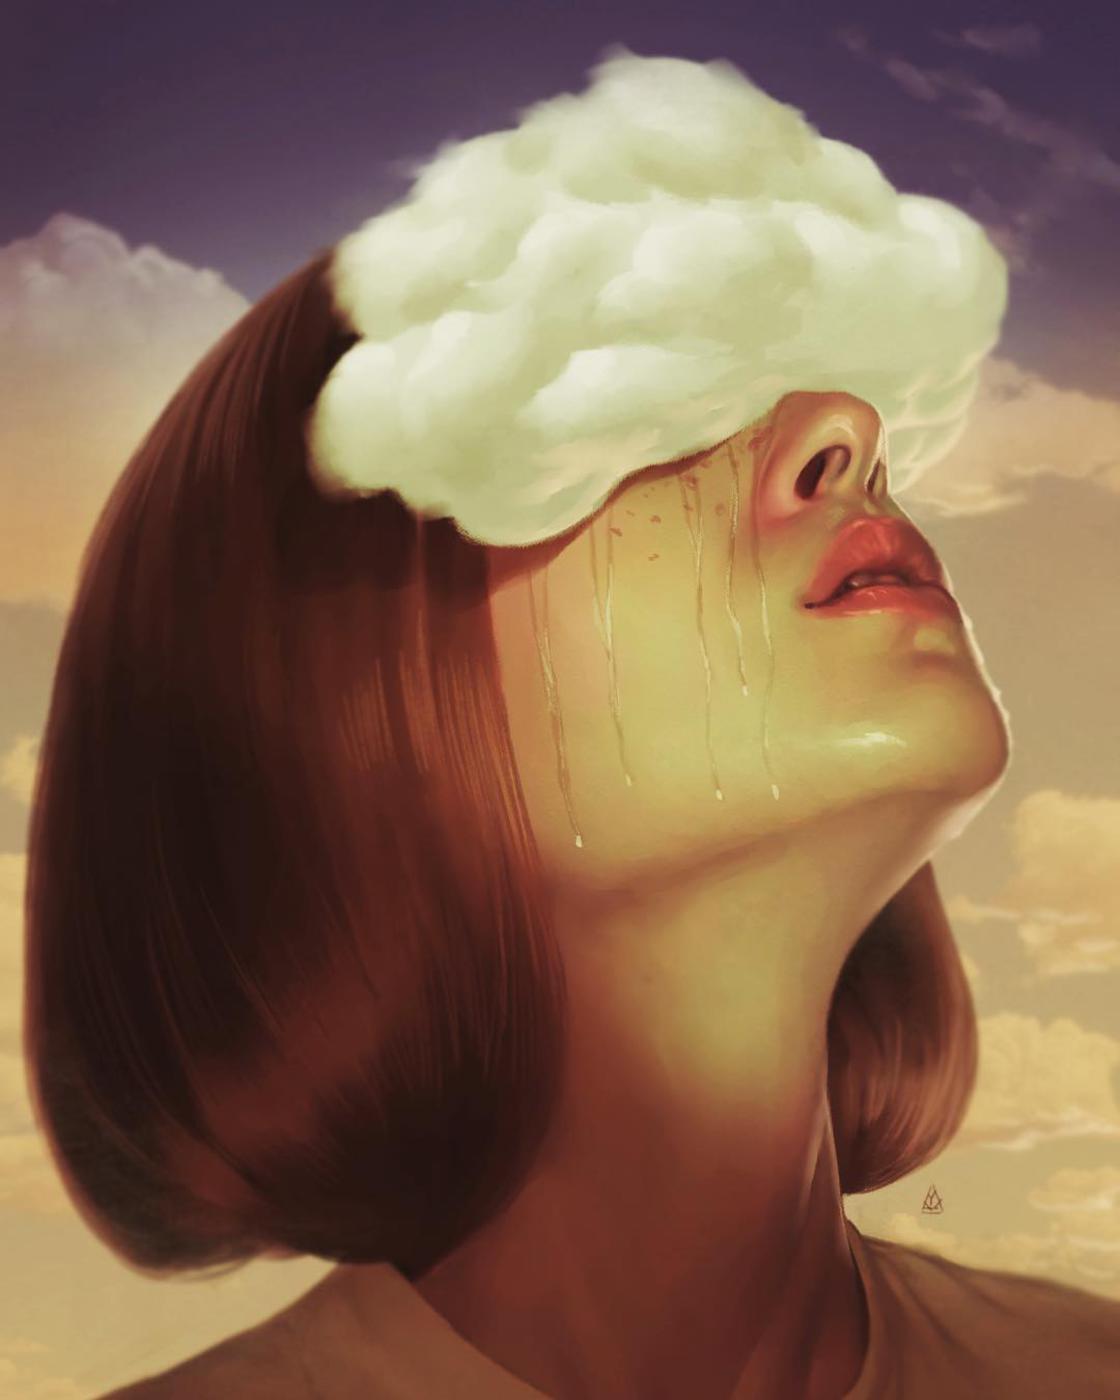 Dreamer – Les nouvelles illustrations surrealistes d'Aykut Aydogdu